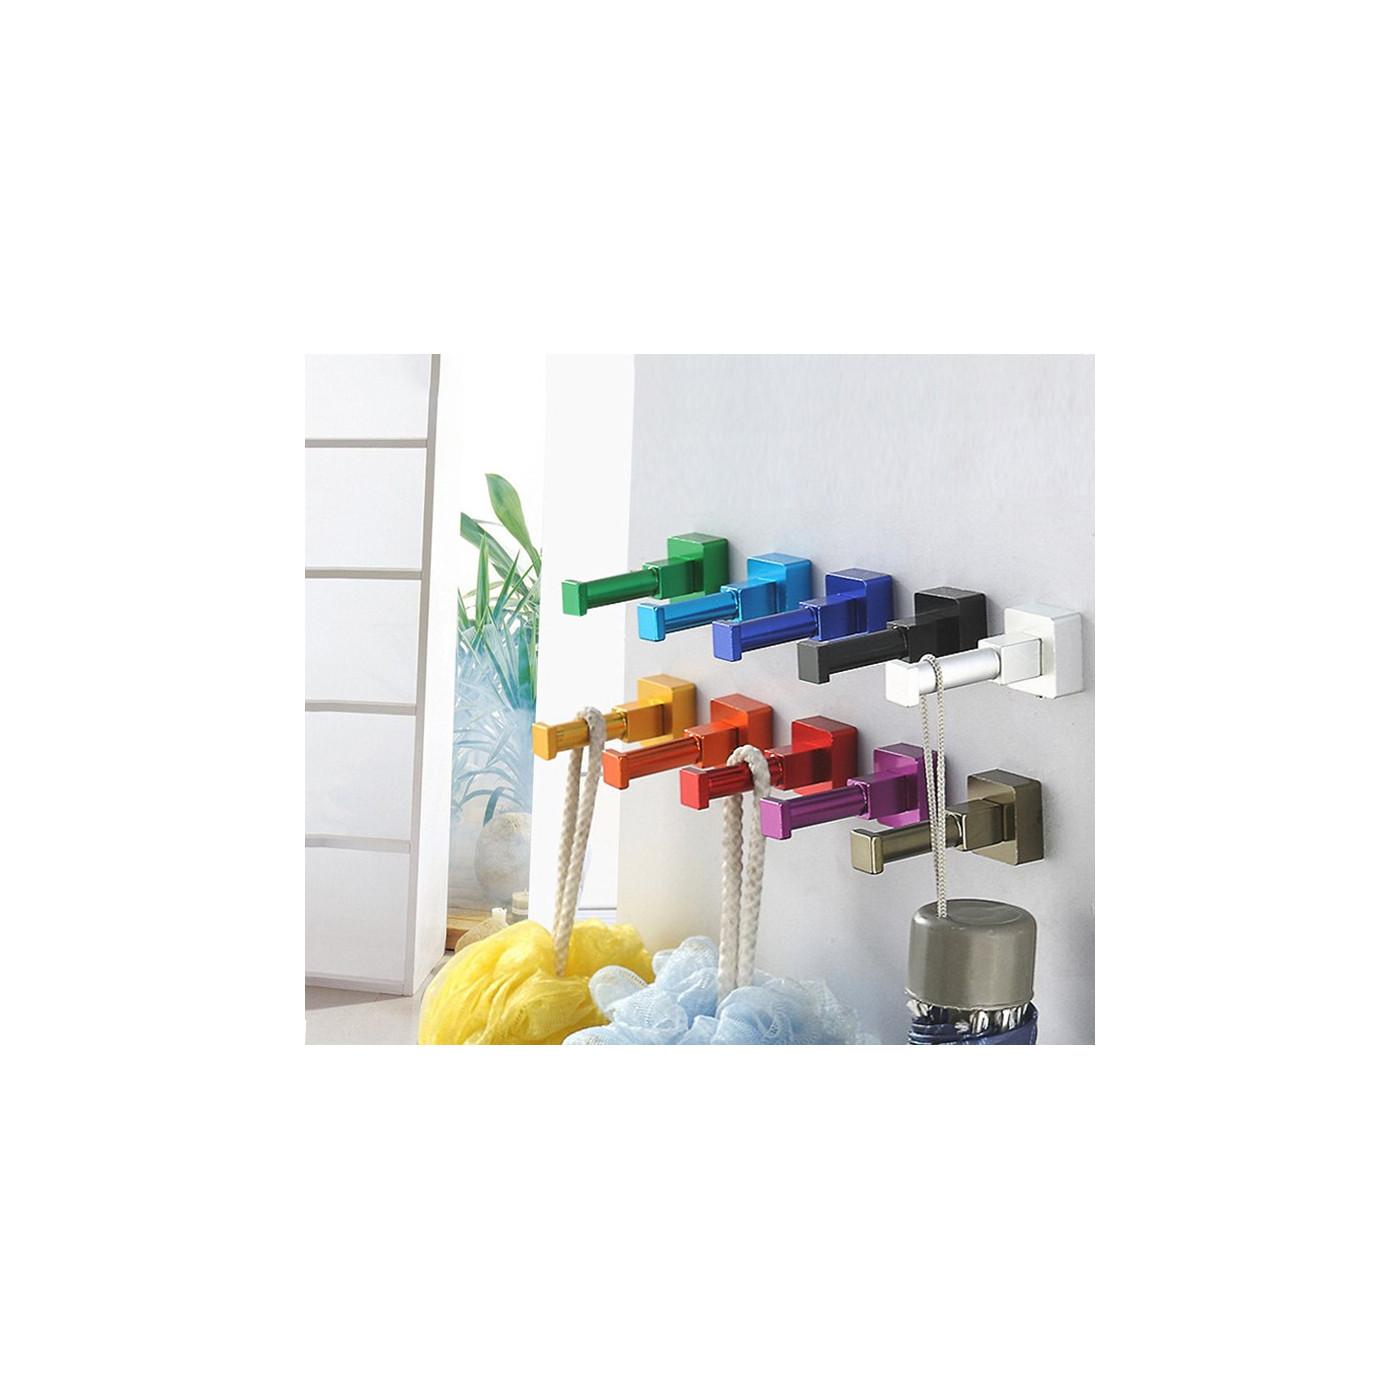 Set of 10 colorful clothes hooks (aluminum, square, gold)